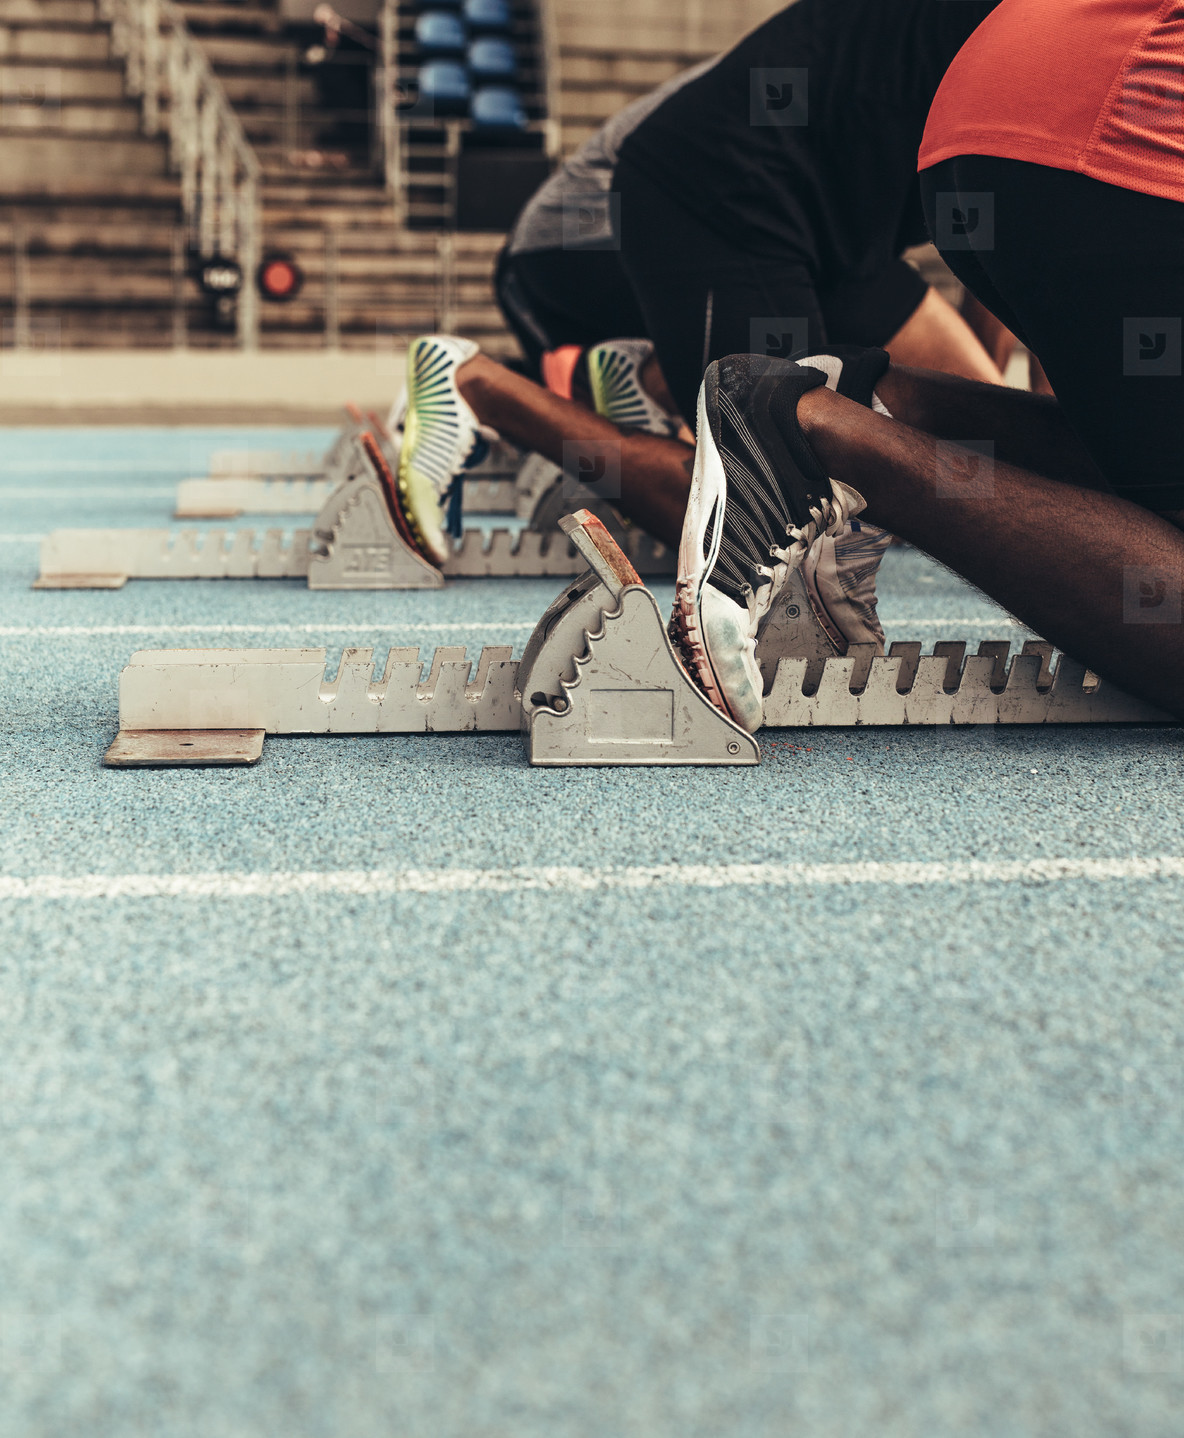 Athletes resting their feet on starting blocks on running track